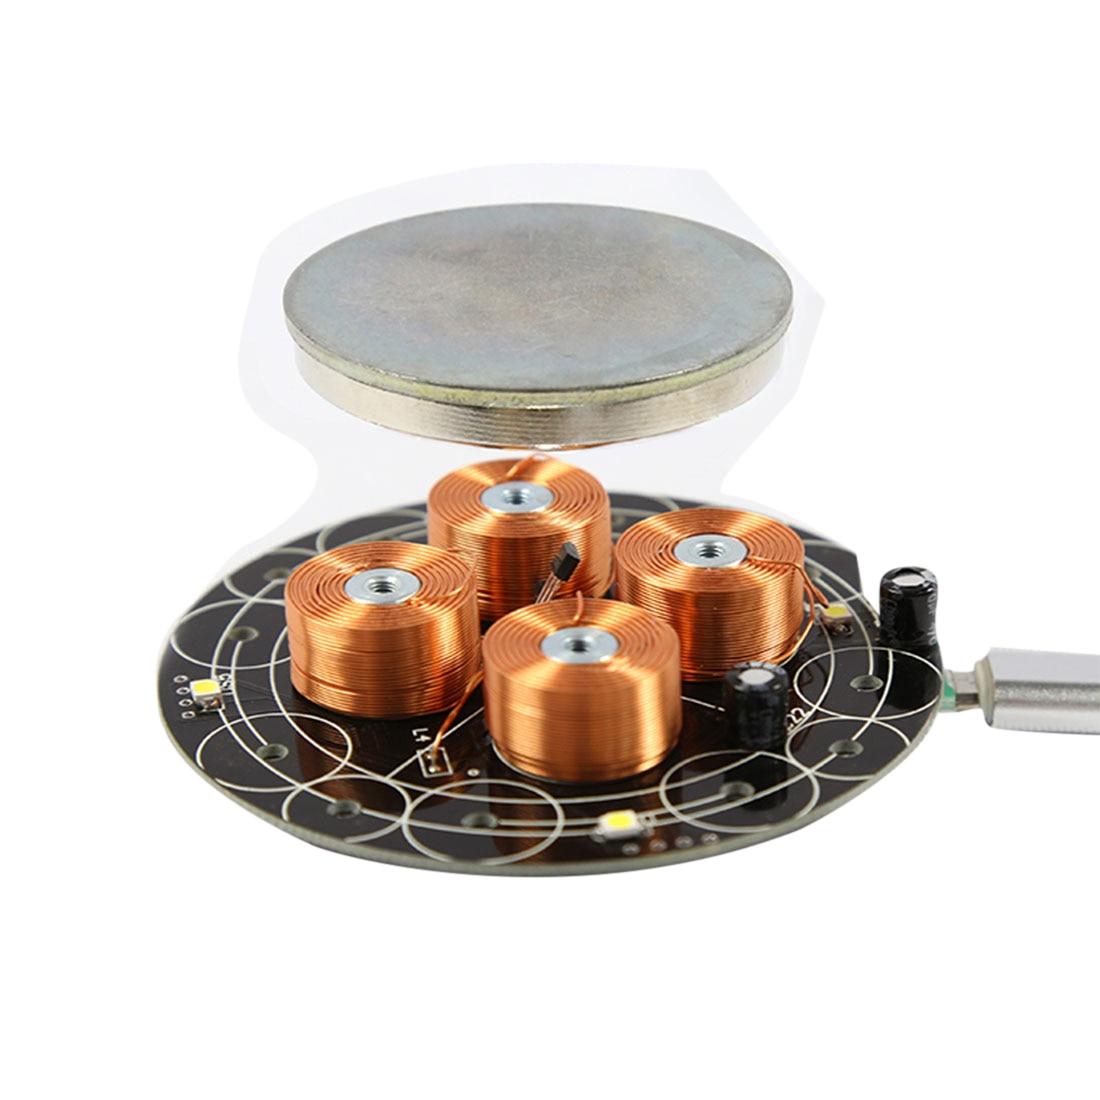 Magnetic Levitation Module DIY Maglev Furnishing Articles Kit Load-Bearing 500g For Kids Developmental Early Educational Toys